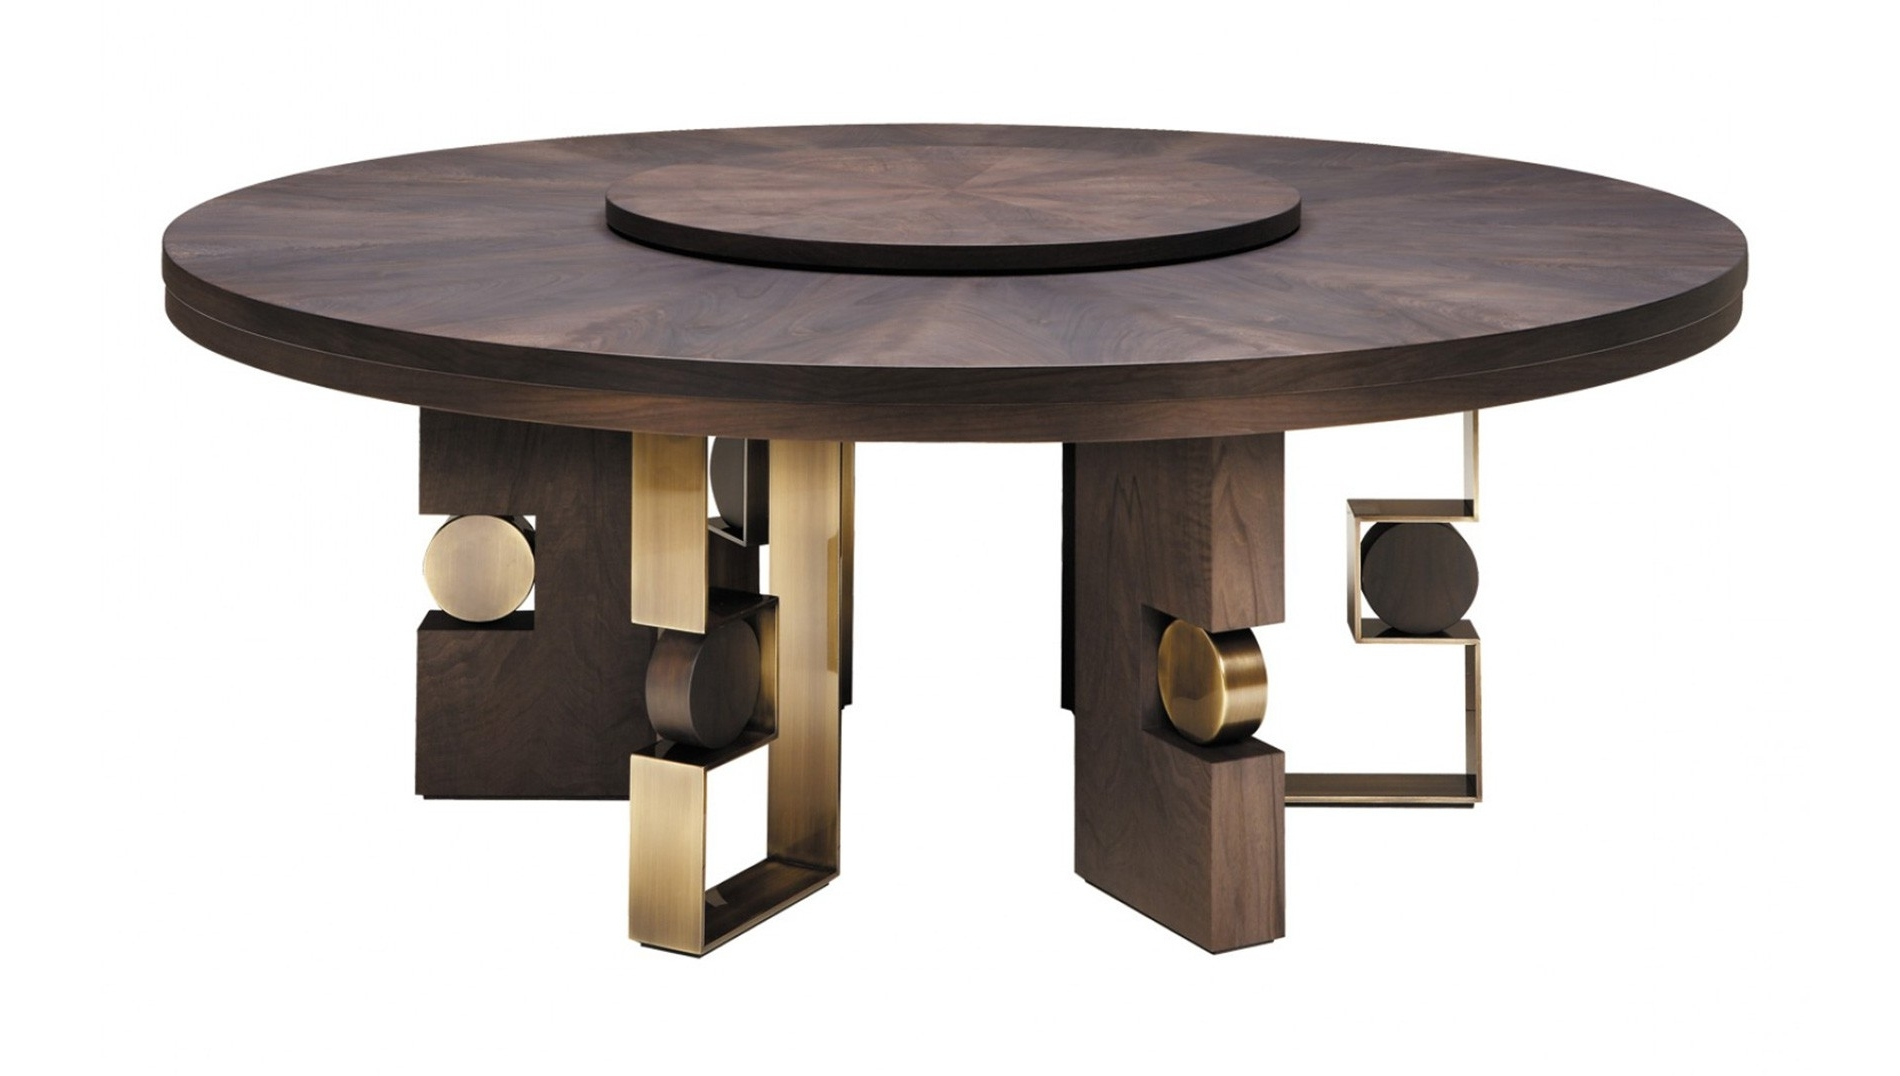 Trendy Smania, Rodrigo Circular Dining Table – Luxdeco Within Circular Dining Tables (View 1 of 25)